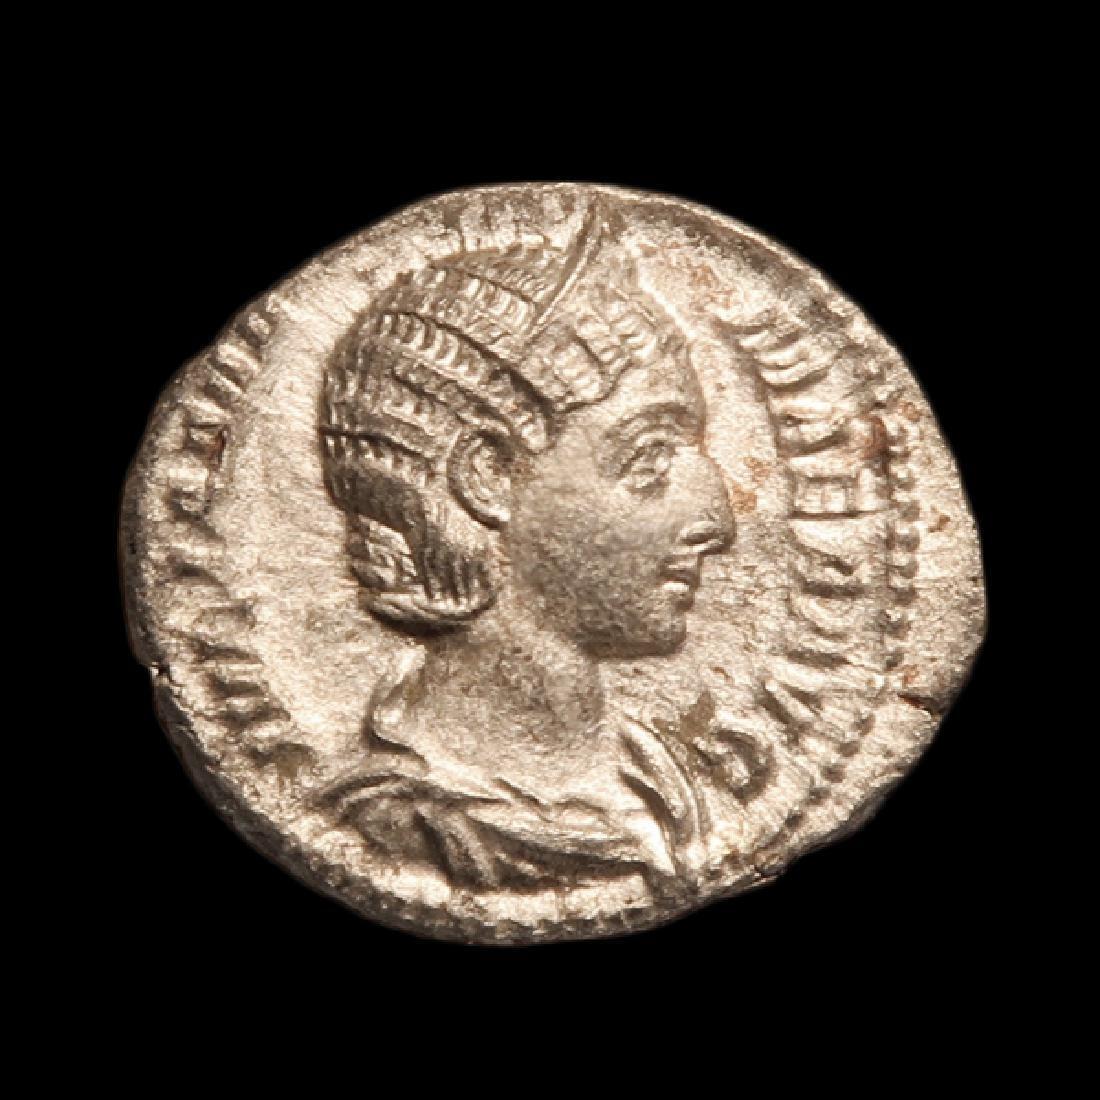 Emperess Julia Maesa SILVER DENARIUS Coin, Struck Rome